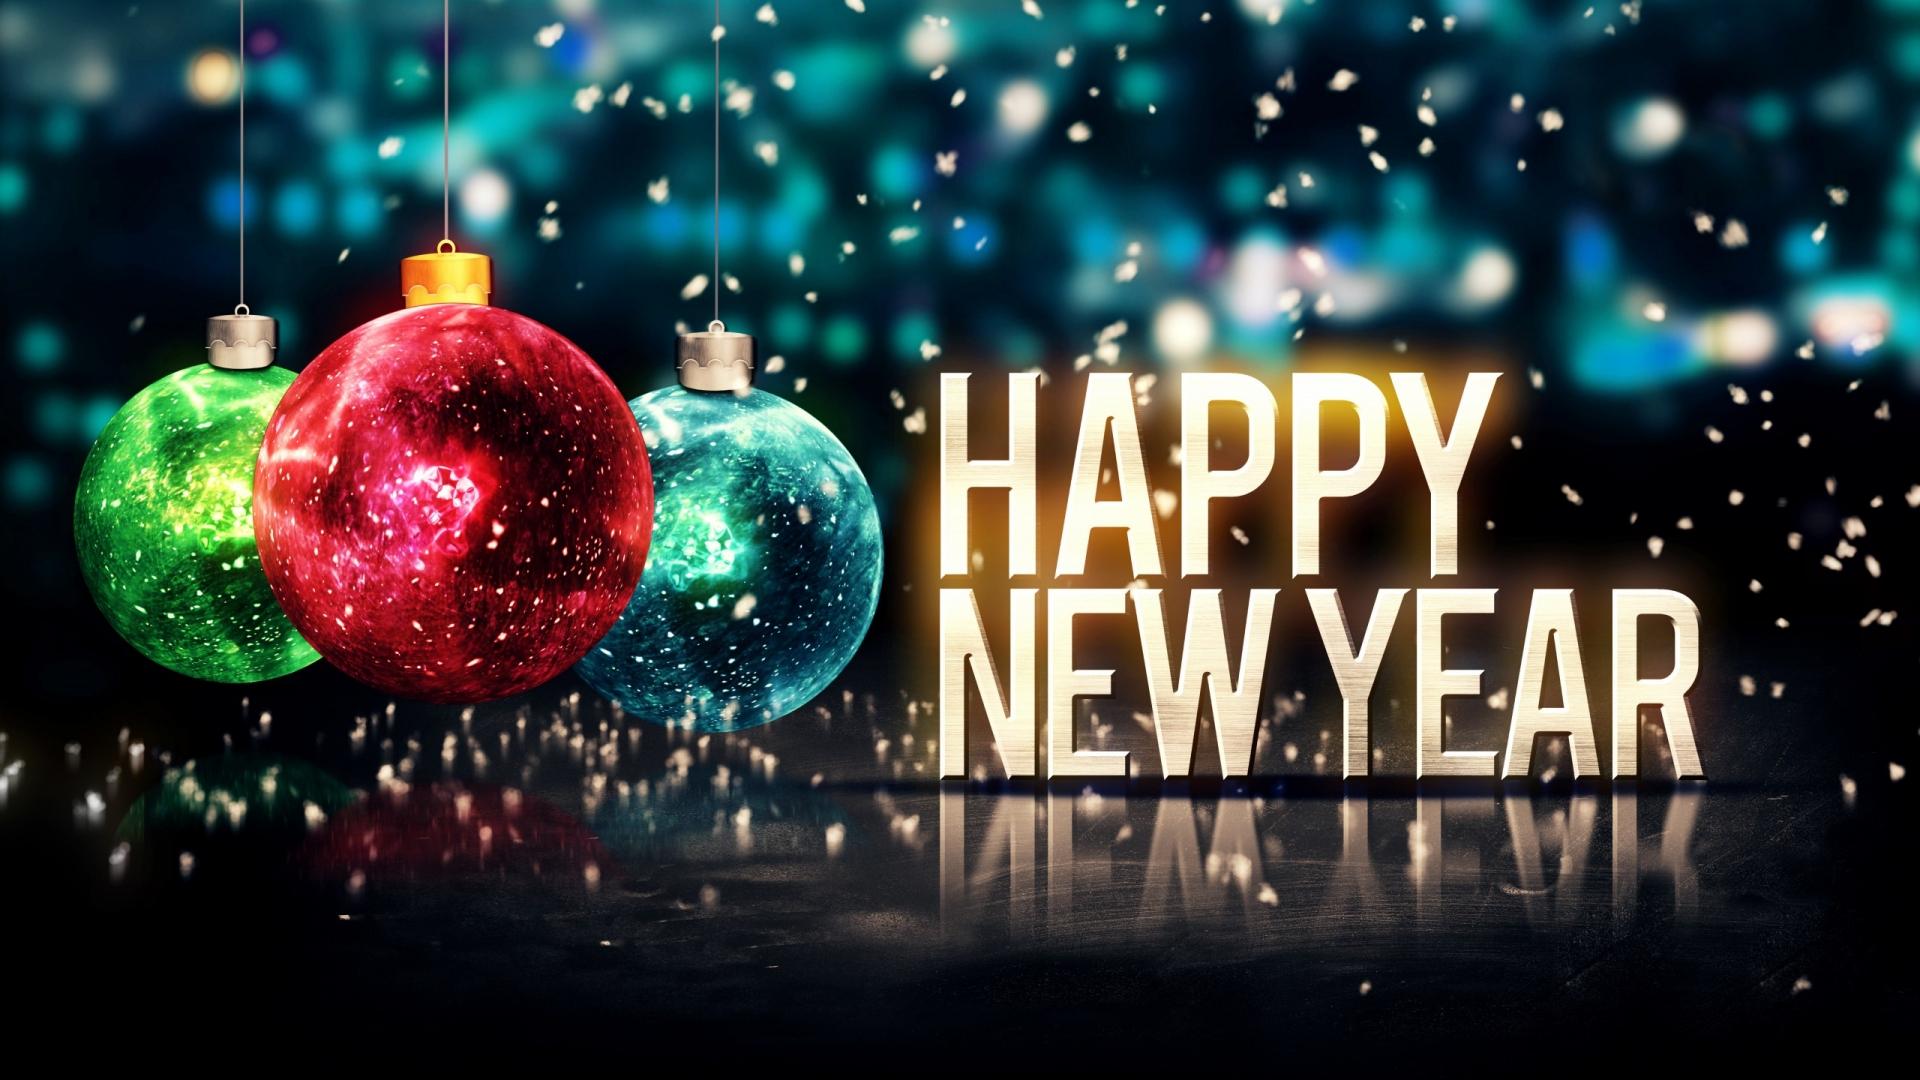 Happy-New-Year-Ornament-wallpaper-wp3606556